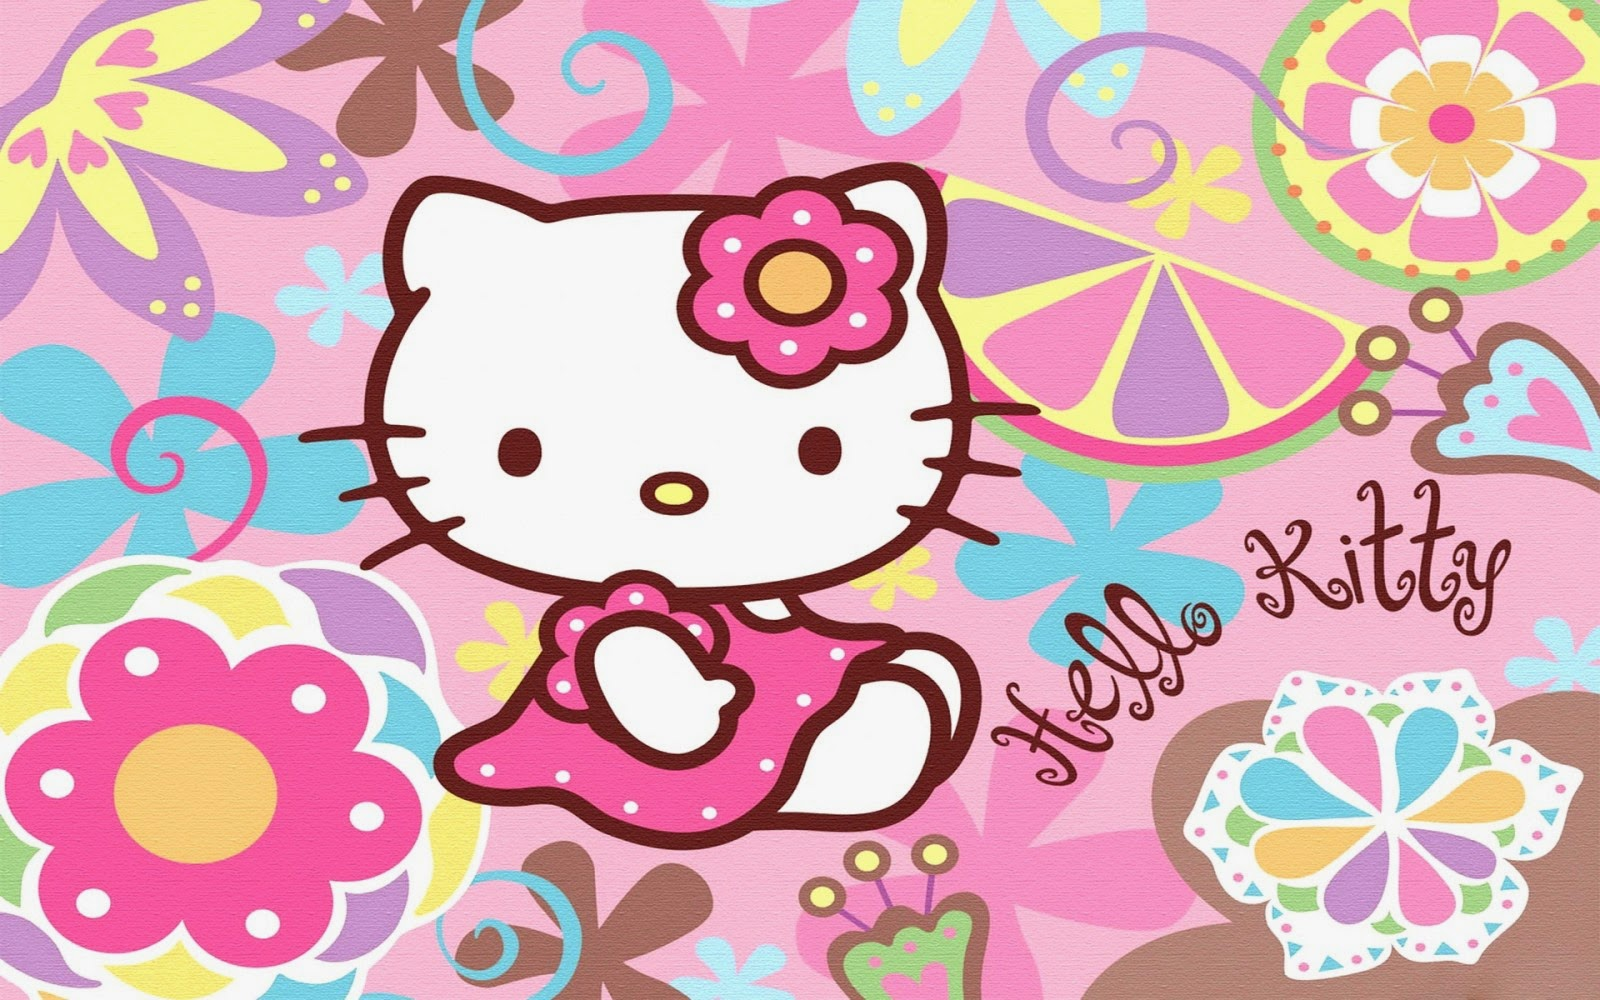 KUMPULAN GAMBAR WALLPAPER HELLO KITTY Gambar Lucu Hello Kitty